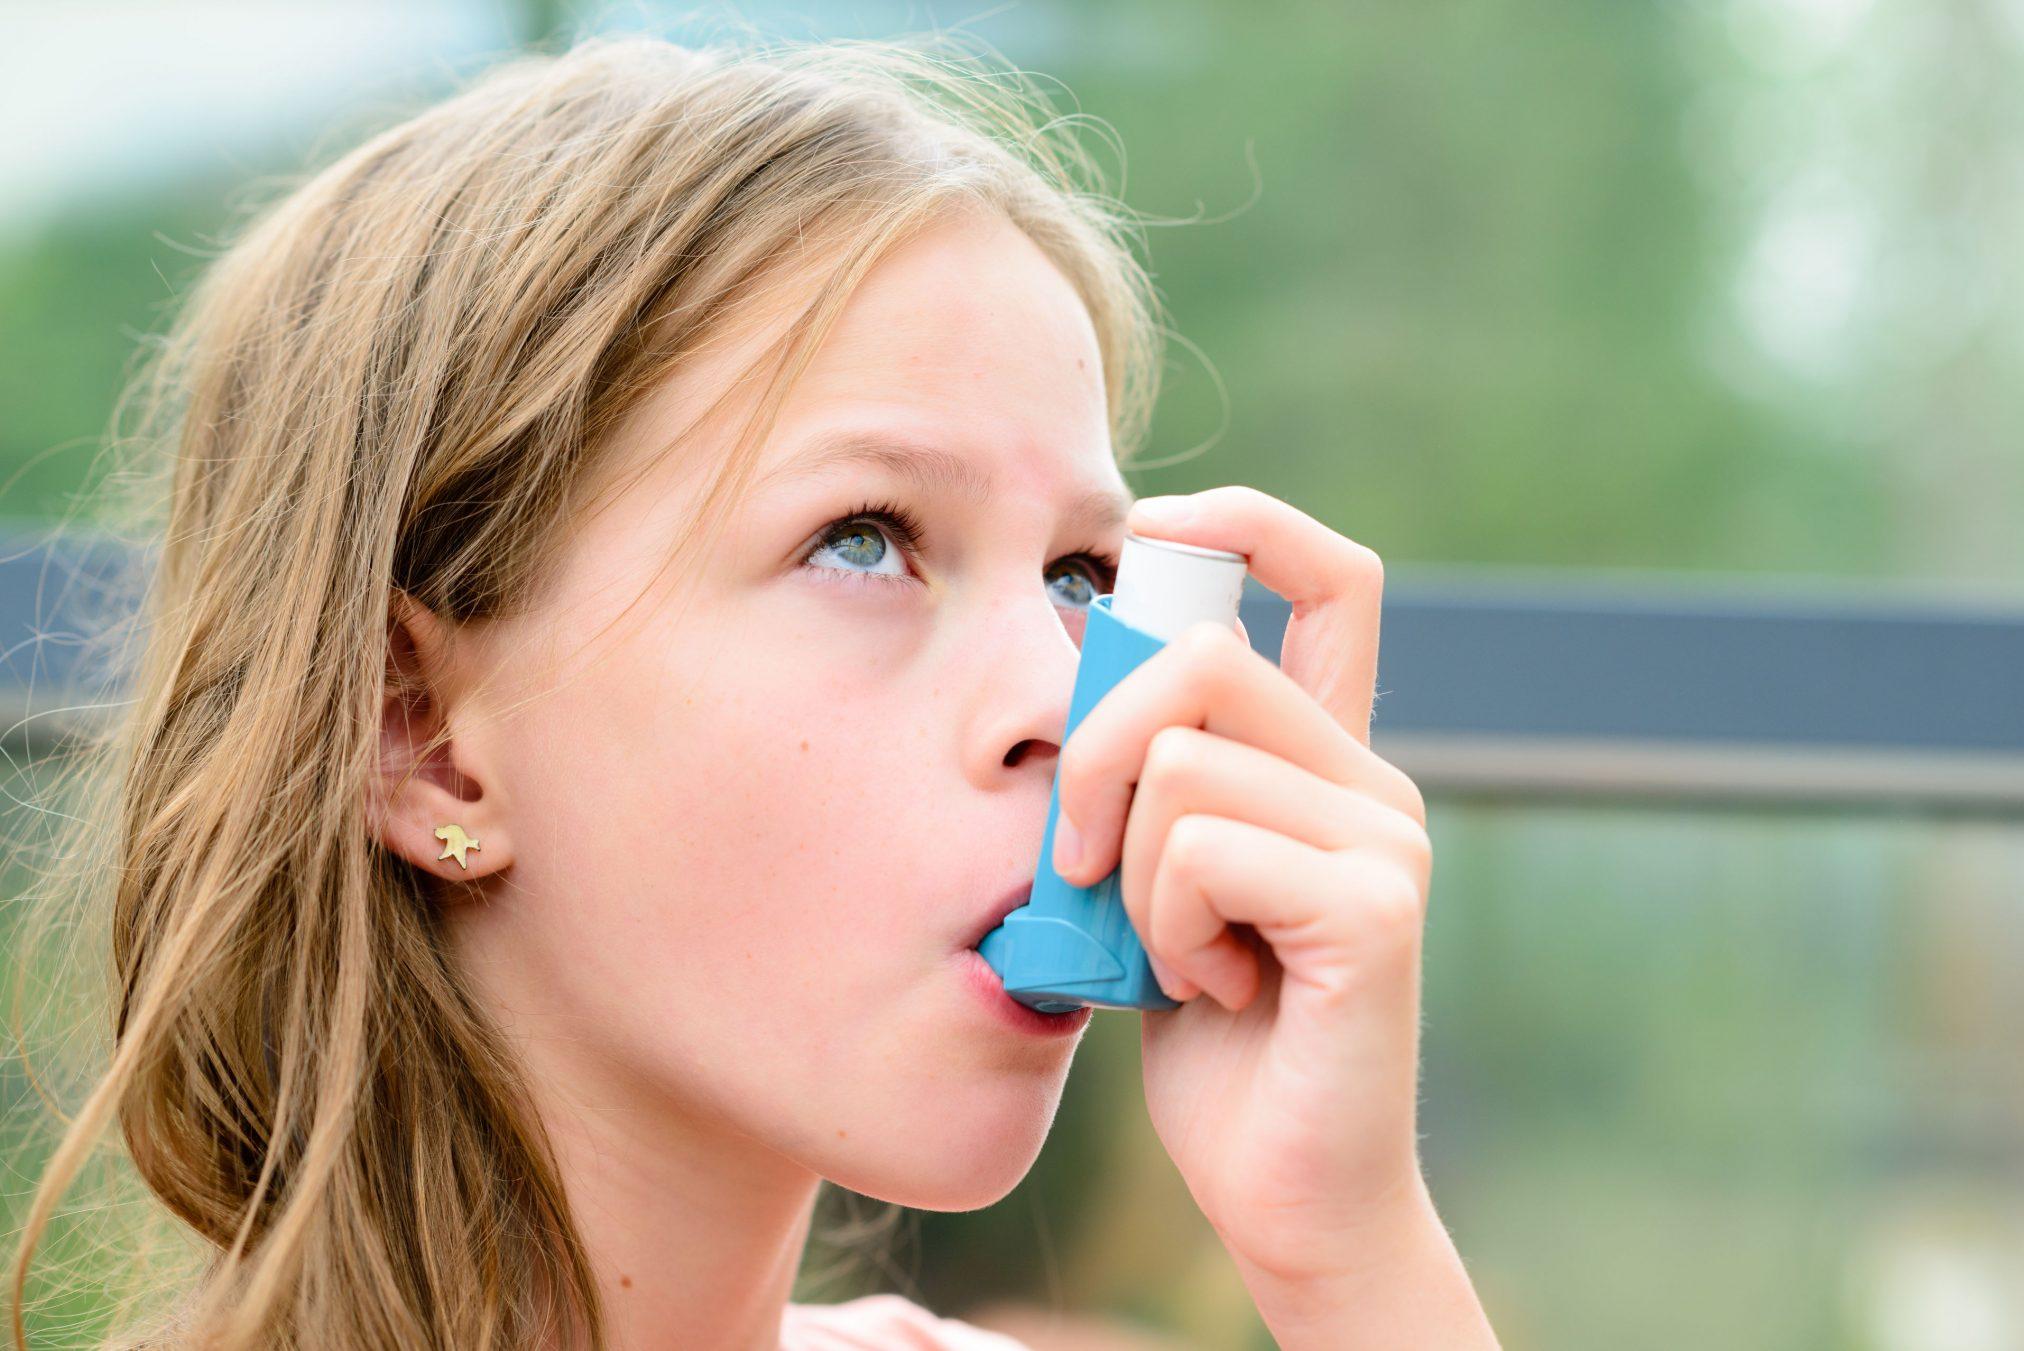 girl using asthma puffer